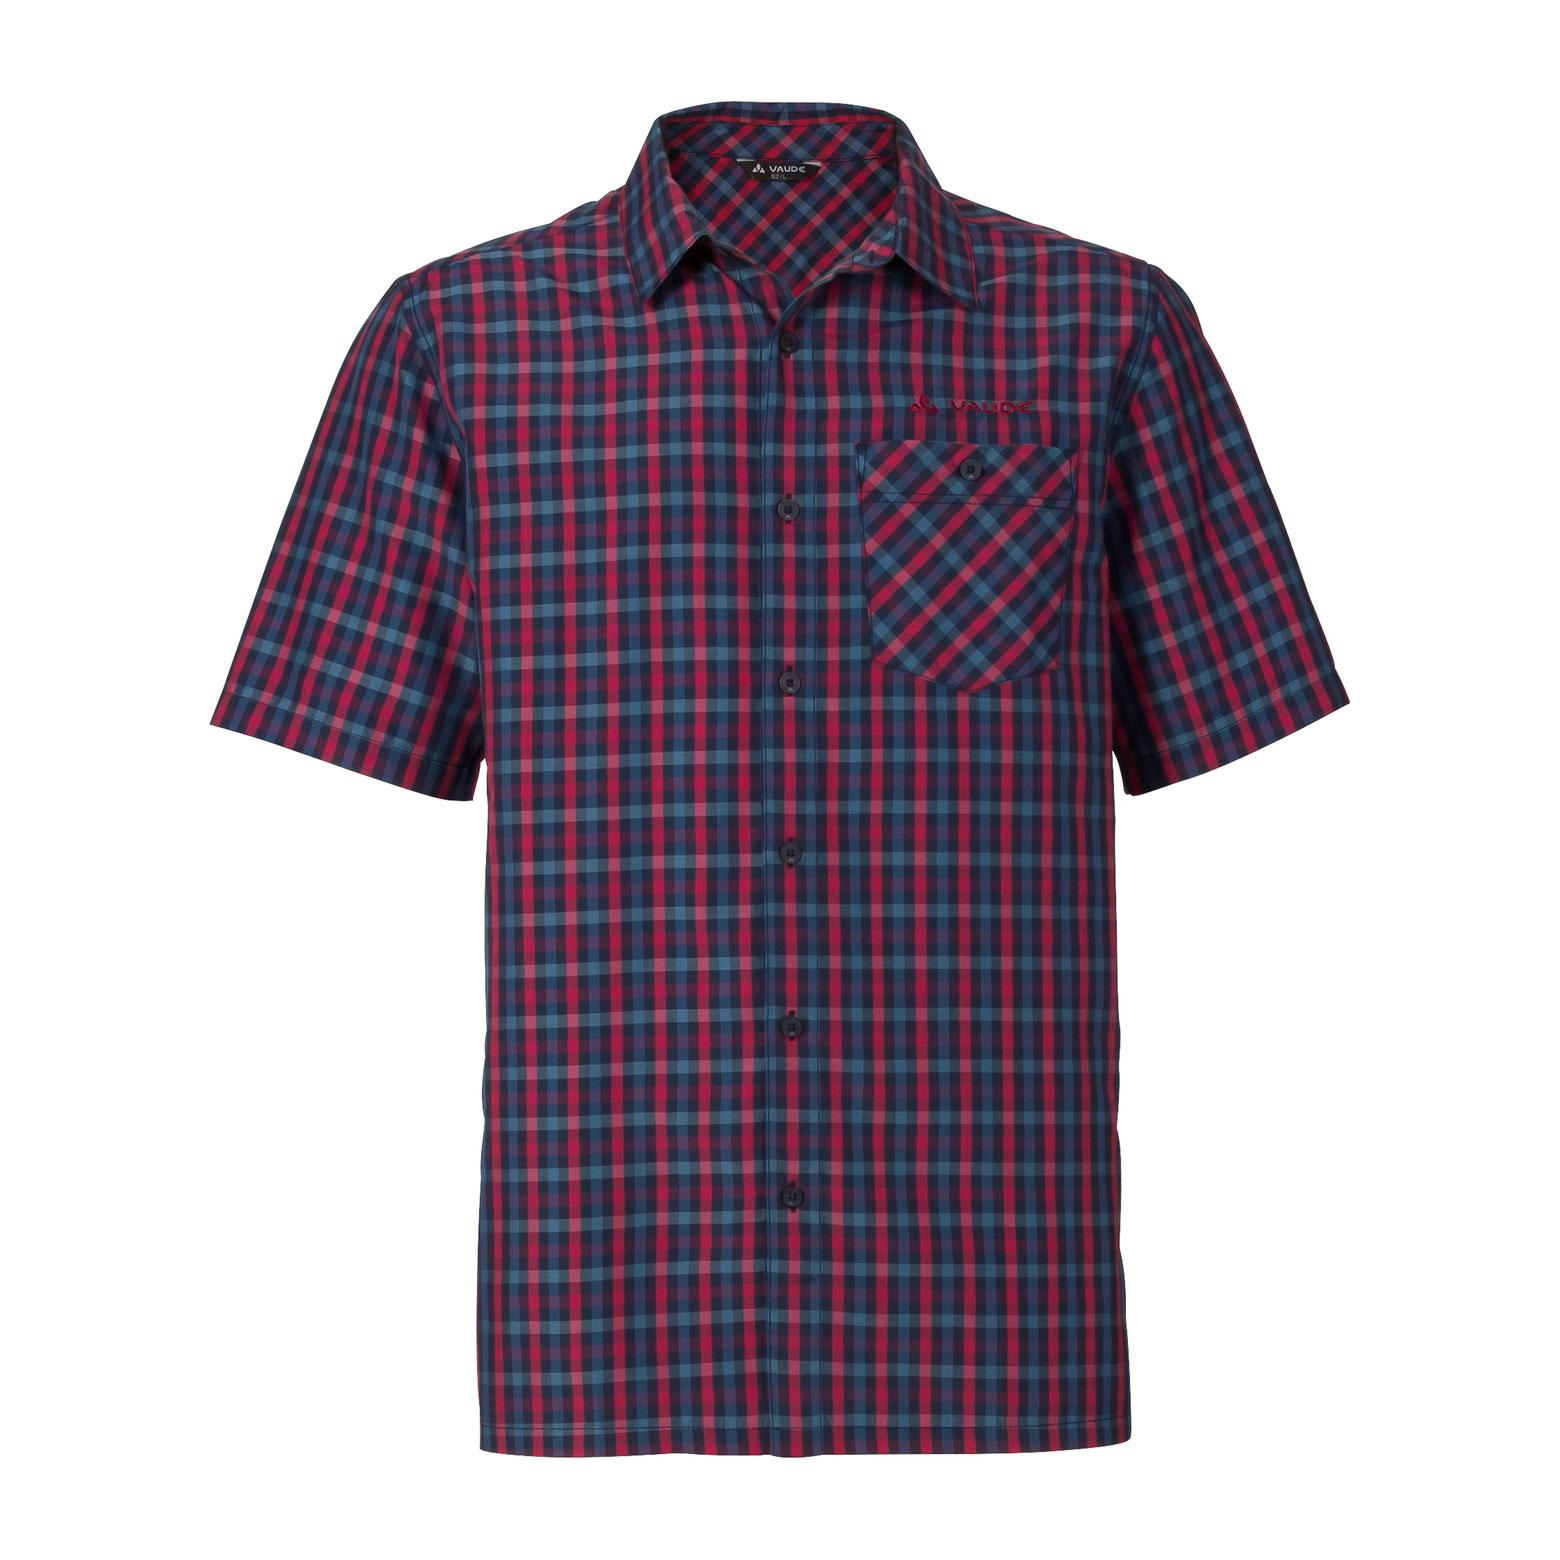 Vaude Herren Hemd Albsteig Shirt 40373-750 XXL